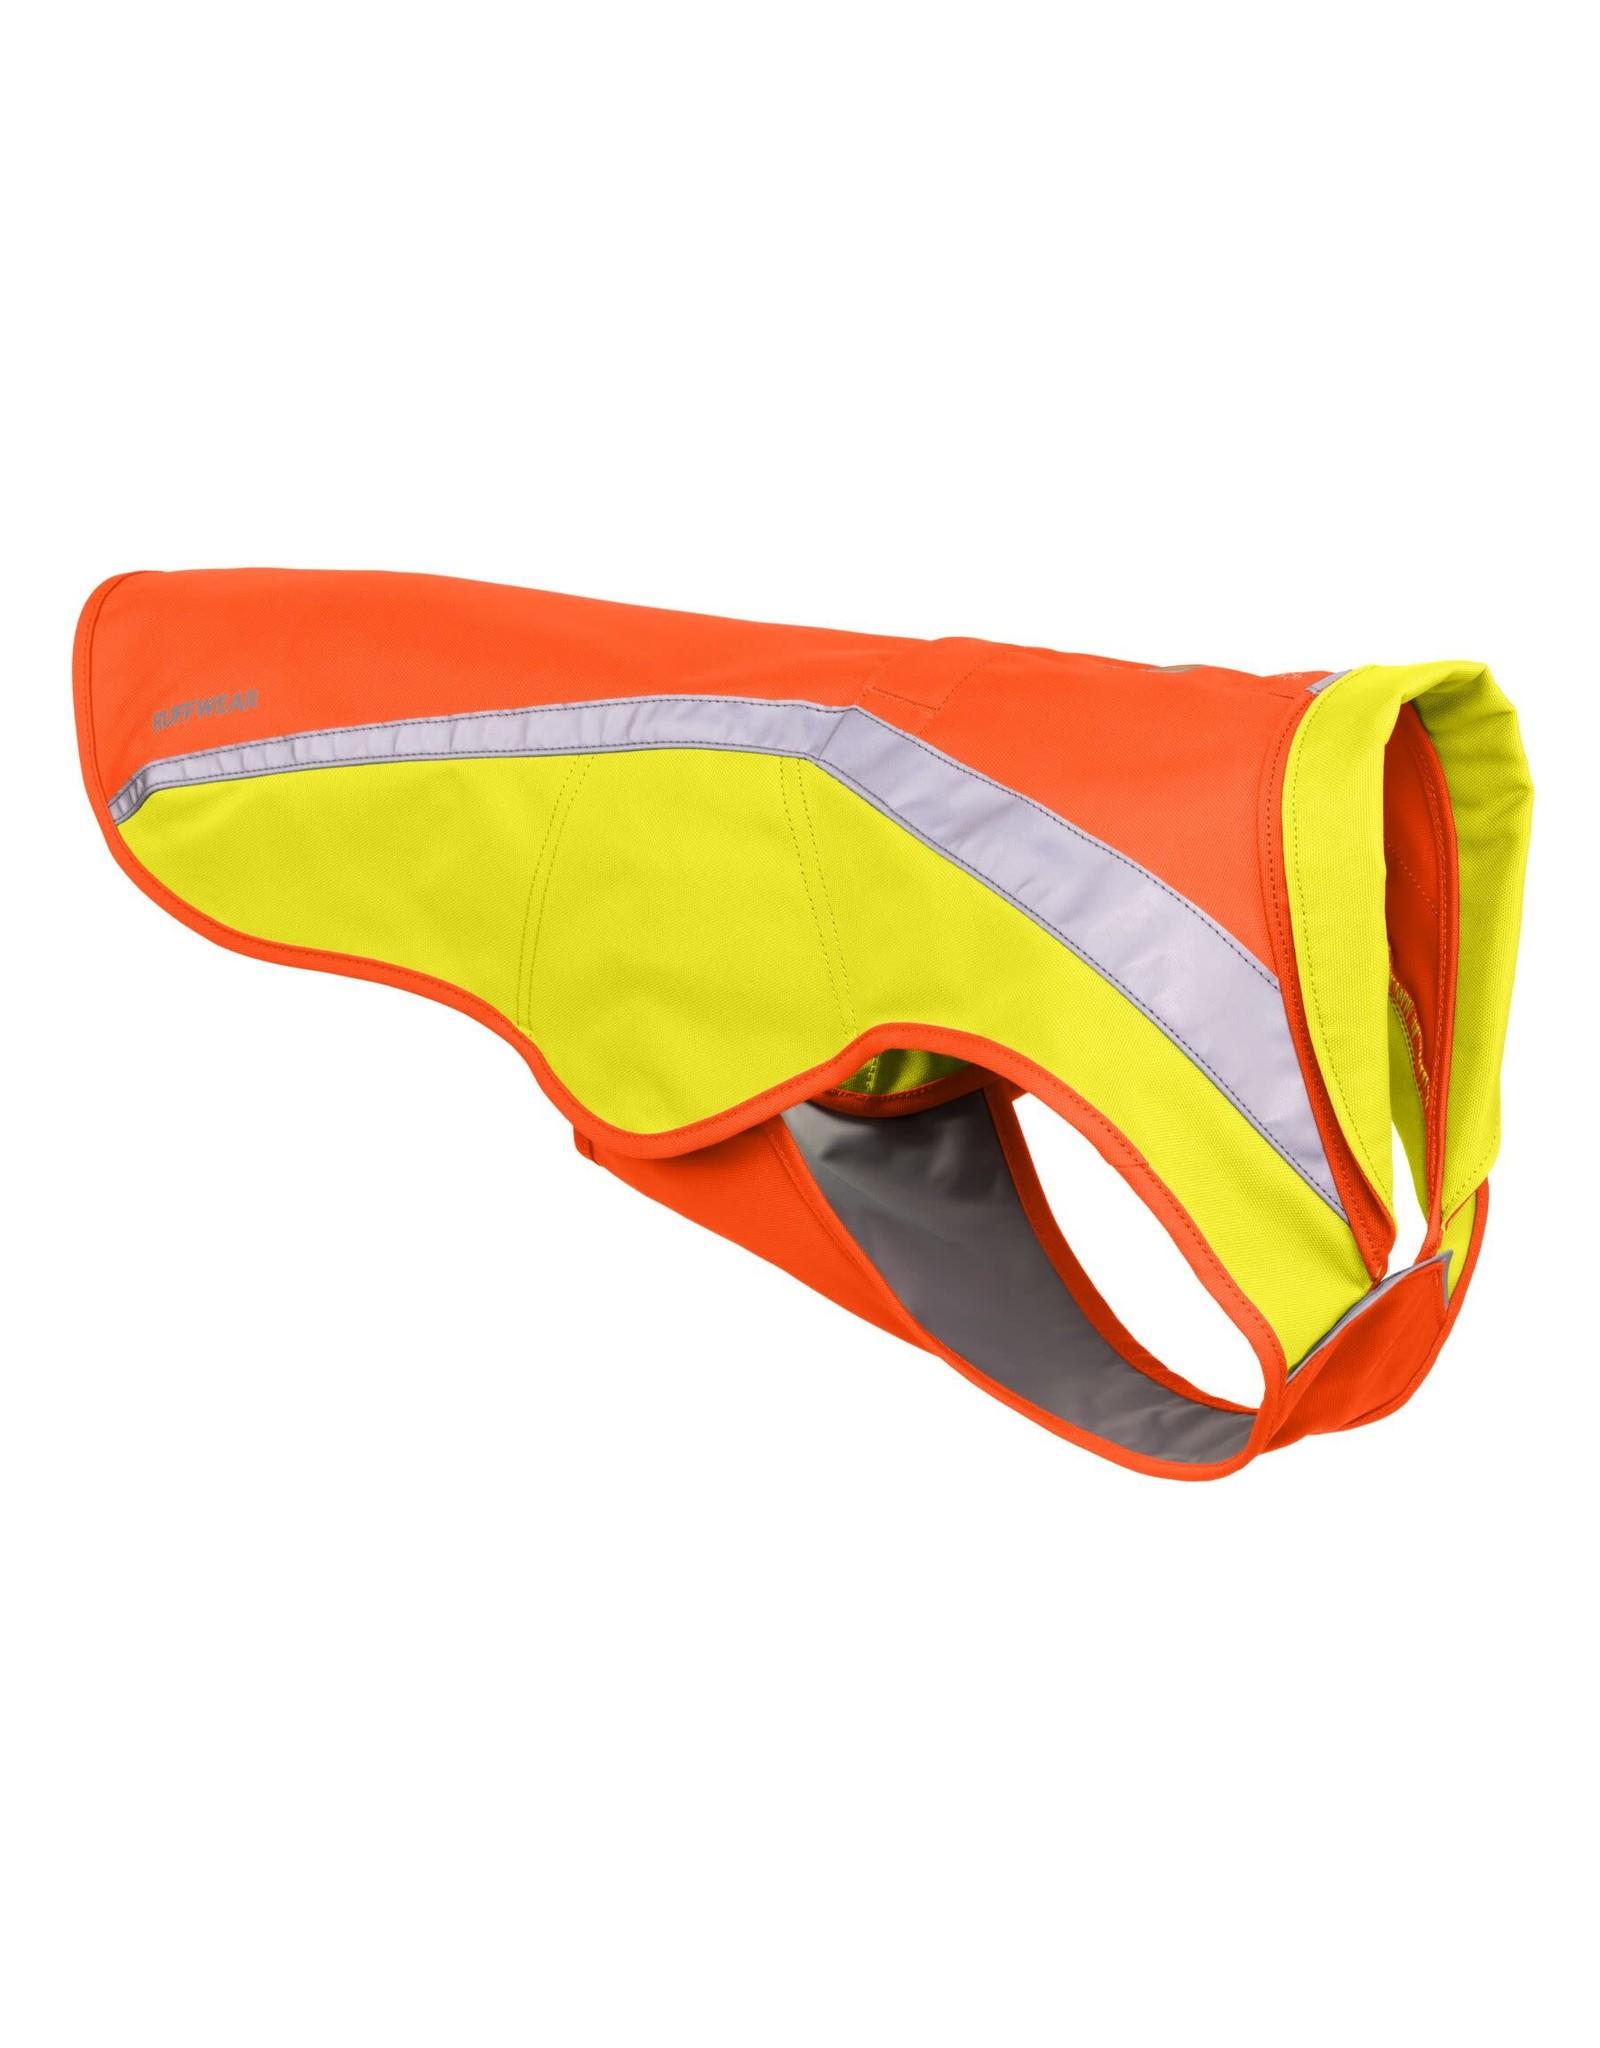 Ruffwear Lumenglow High-Vis Jacket: Blaze Orange, XS